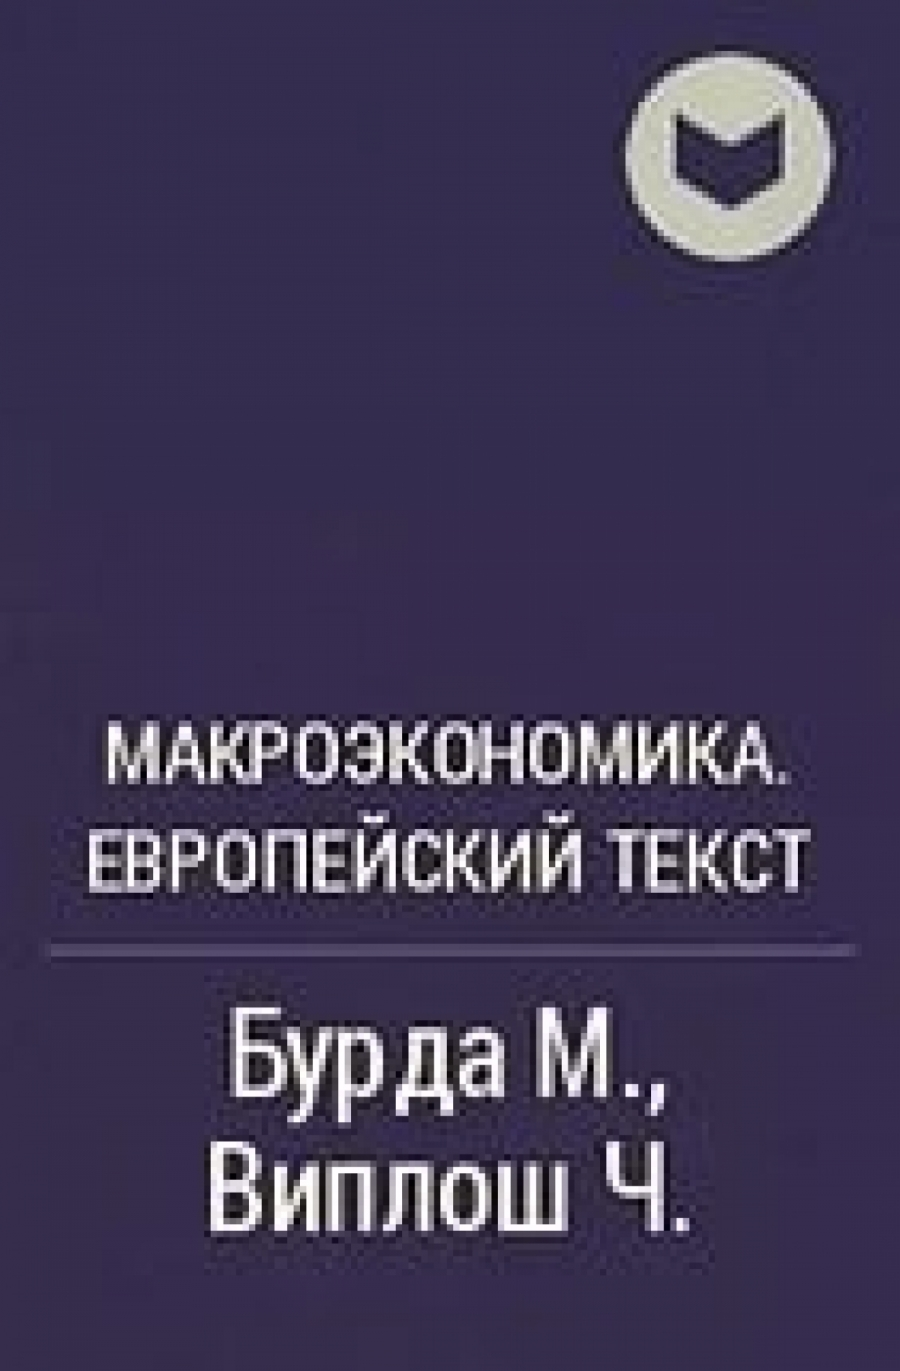 Обложка книги:  бурда м., виплош ч. - макроэкономика европейский текст. 2-е изд